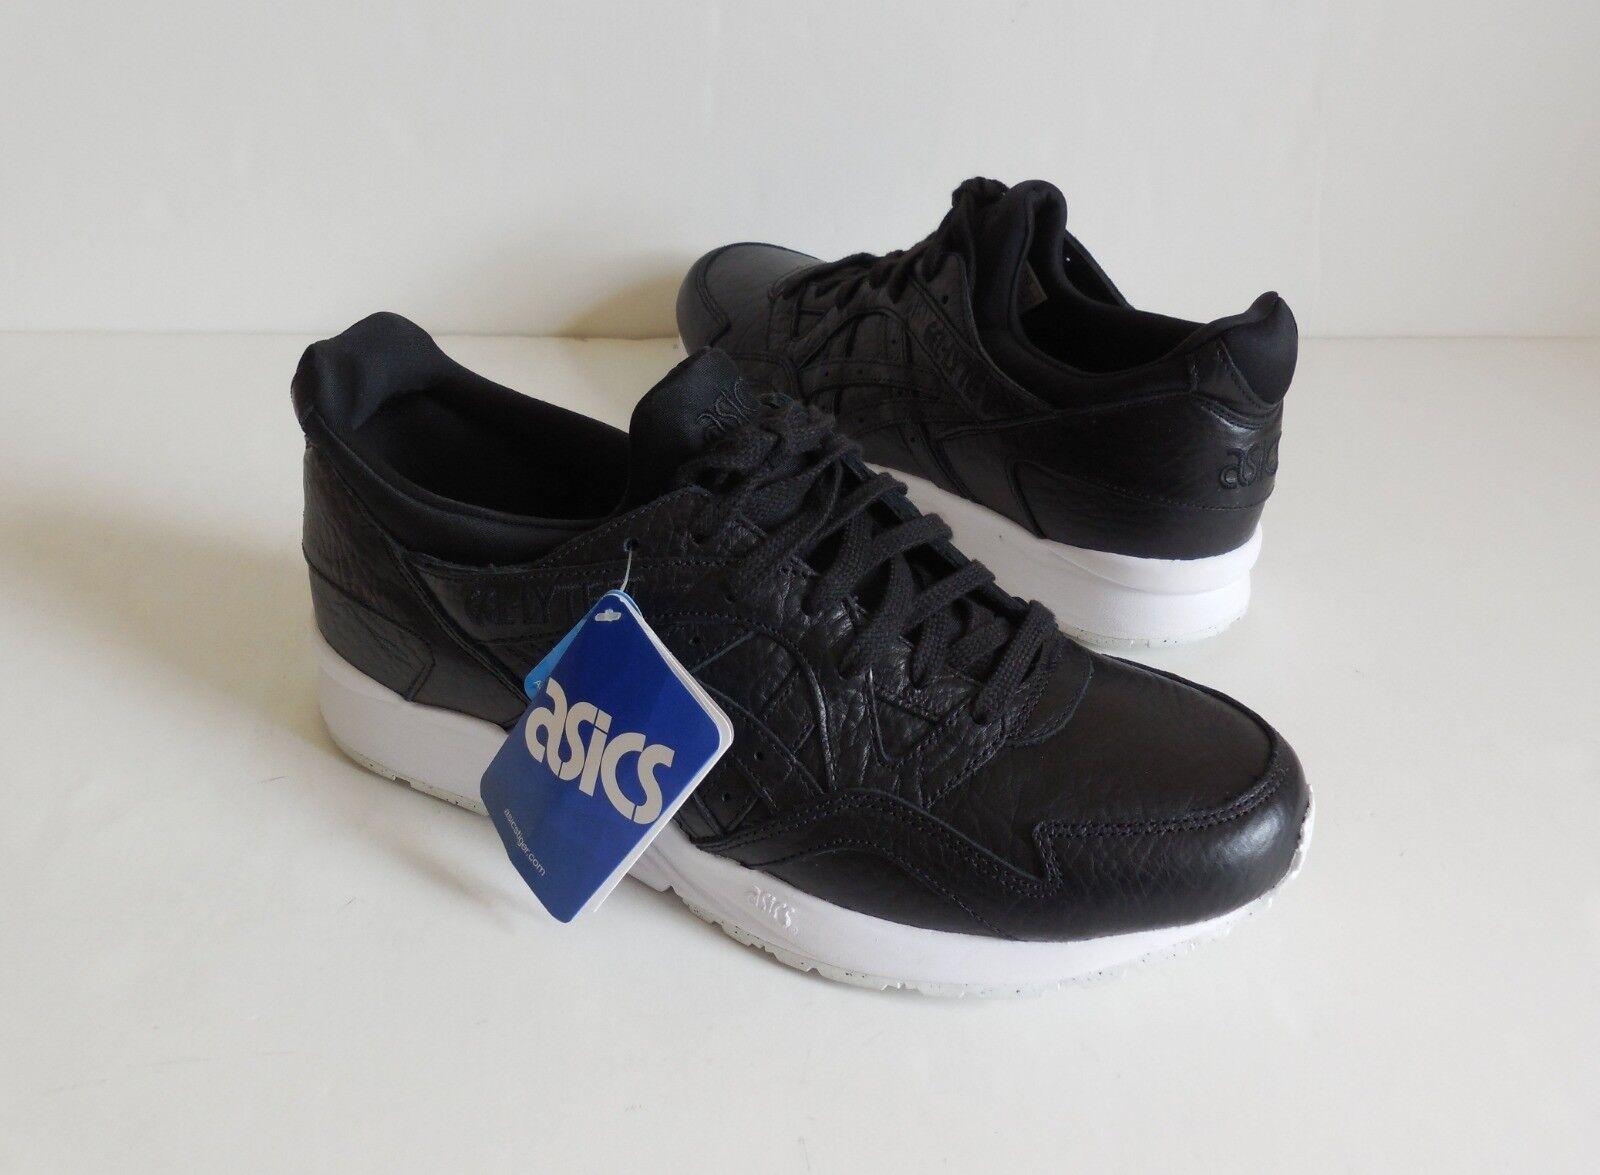 Asics GEL-Lyte V Size HL703 Men's Shoes Size V 11.5 New e52fad